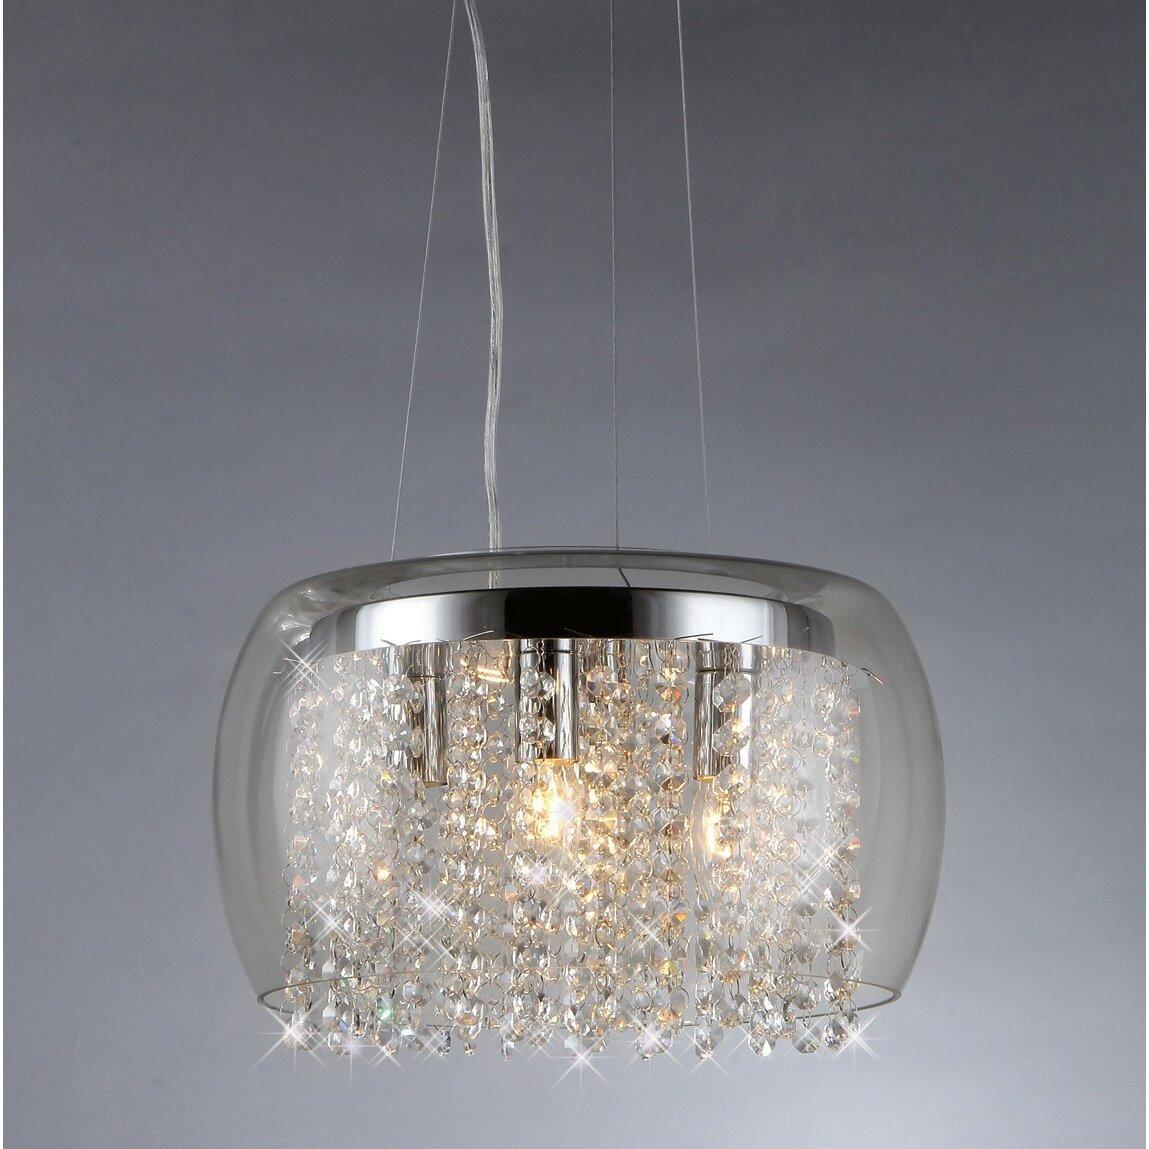 Warehouse of Tiffany Nereids 4Light Crystal Chandelier Reviews – Crystal Chandelier Lights